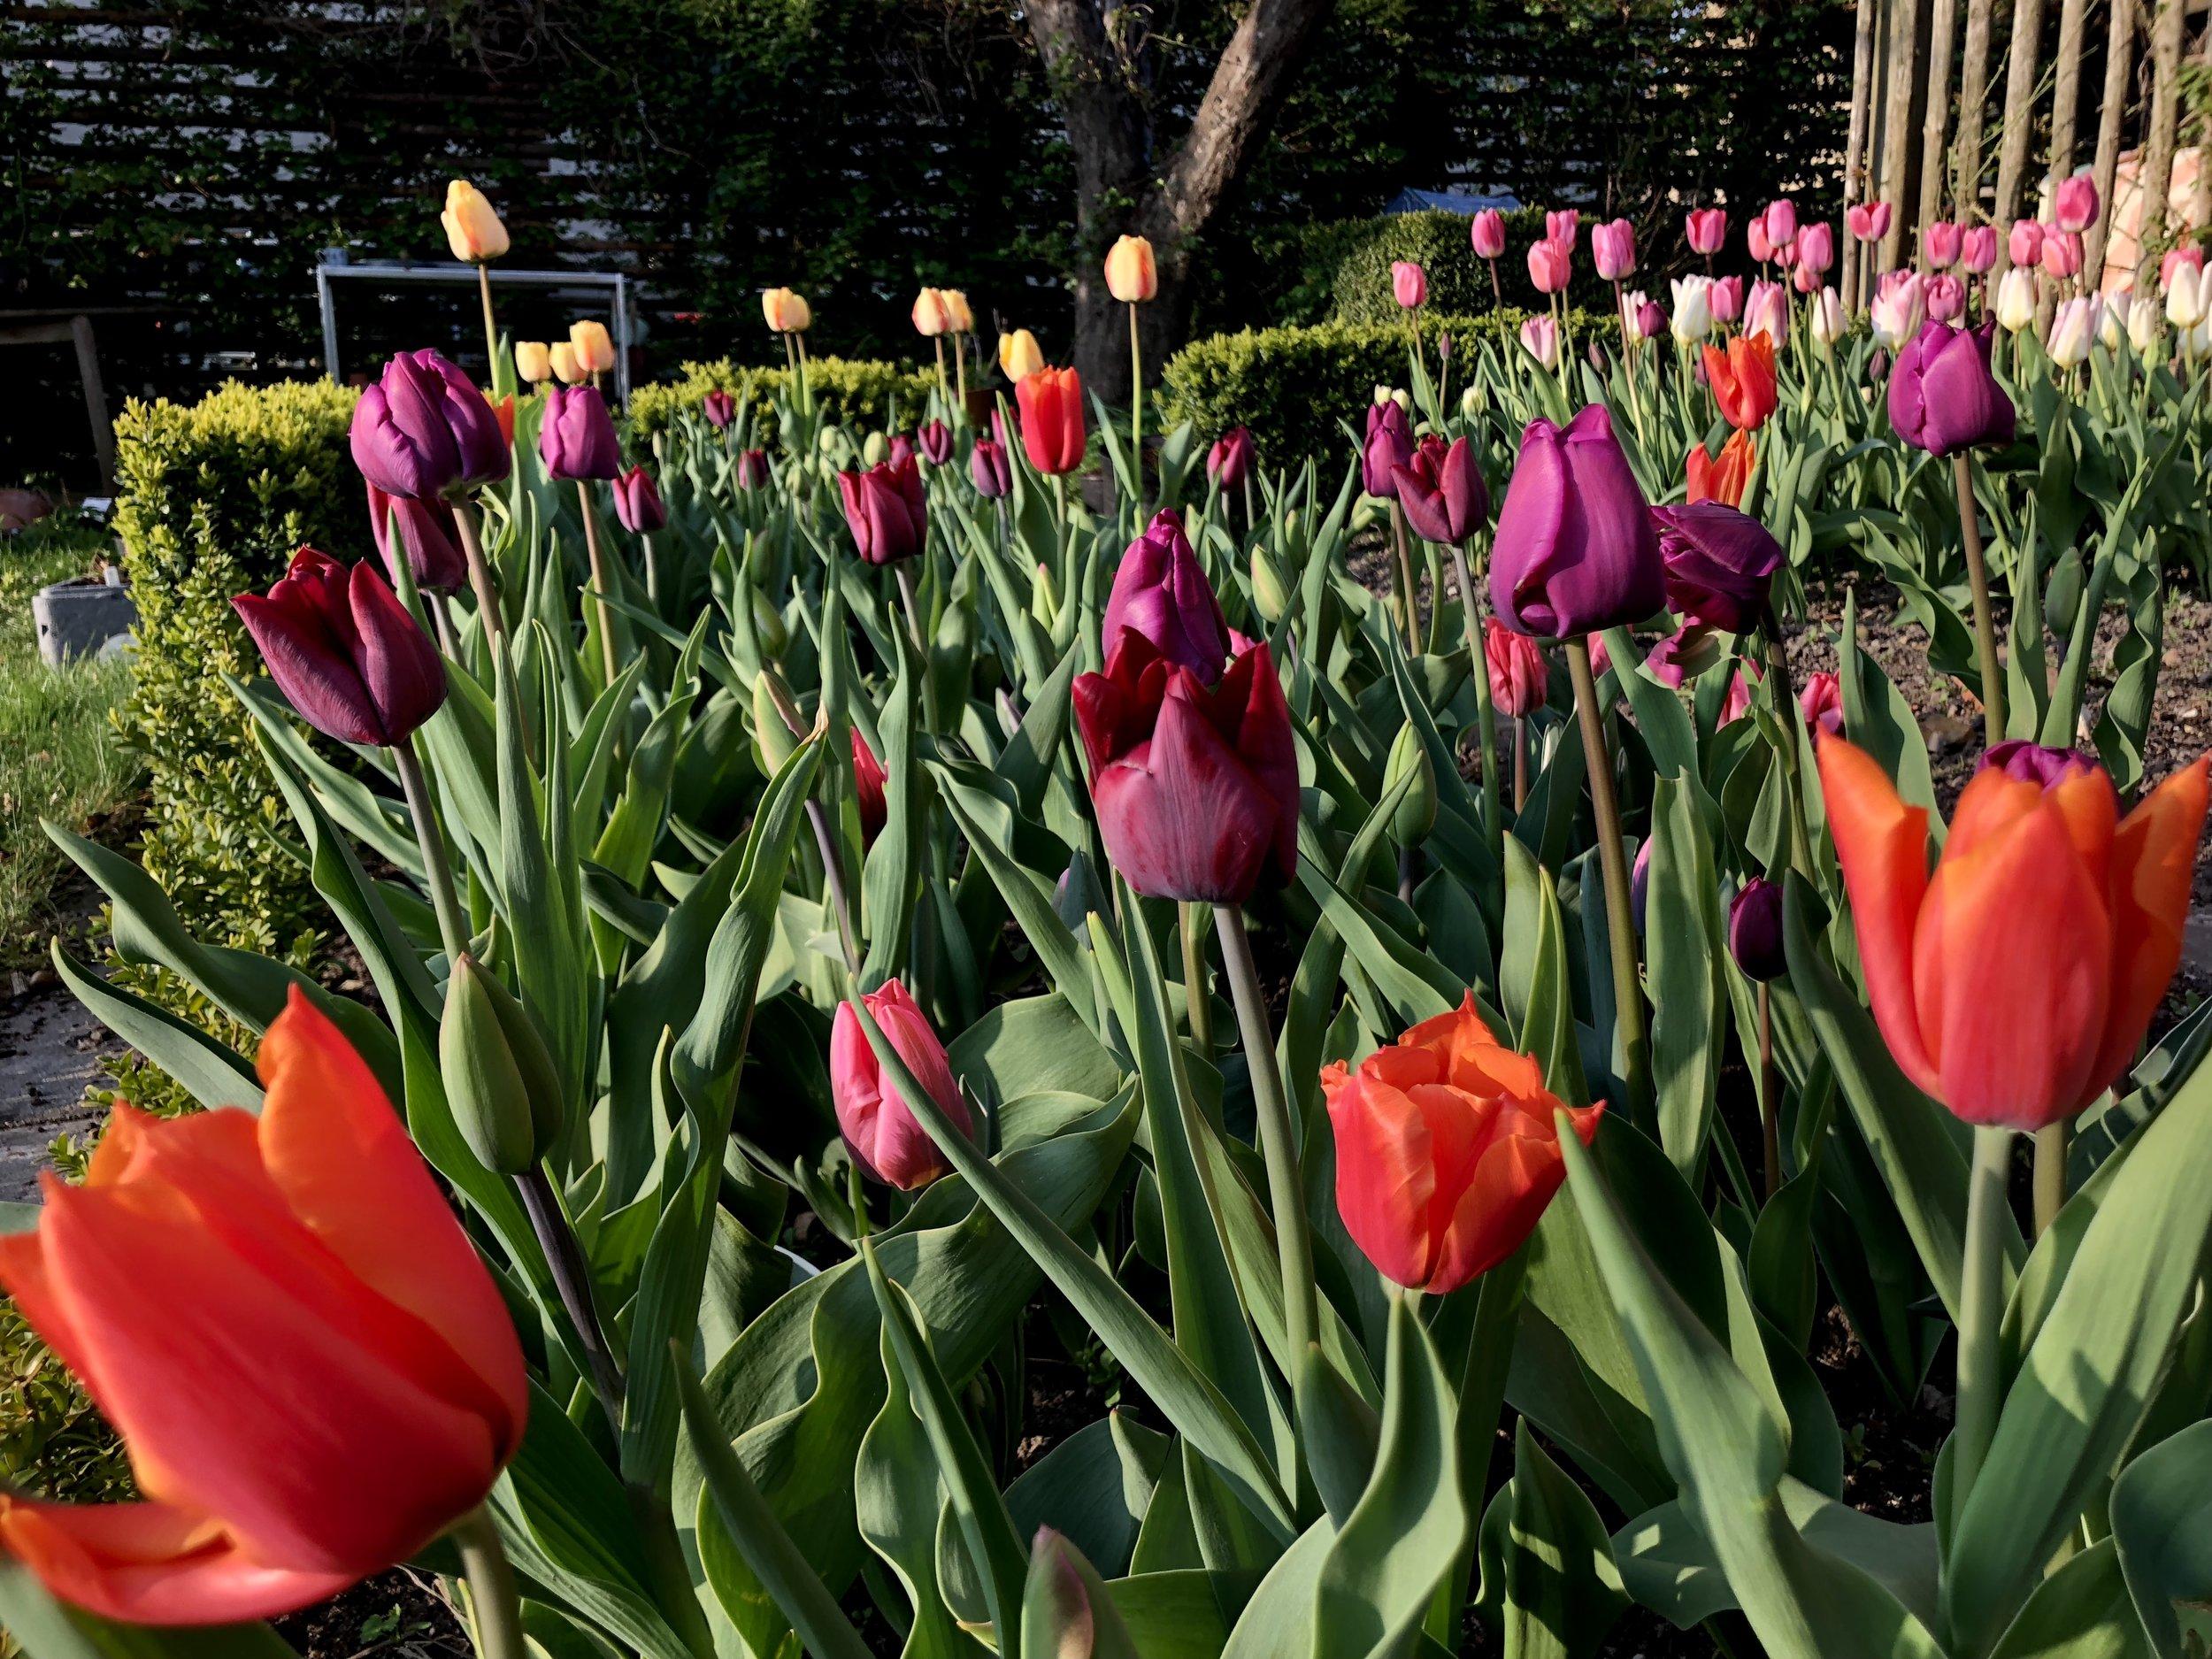 Tulipaner à la Kenzo: 'Queen of Night', 'Nightrider', 'Orange Dynasty' og 'Pretty Princess'